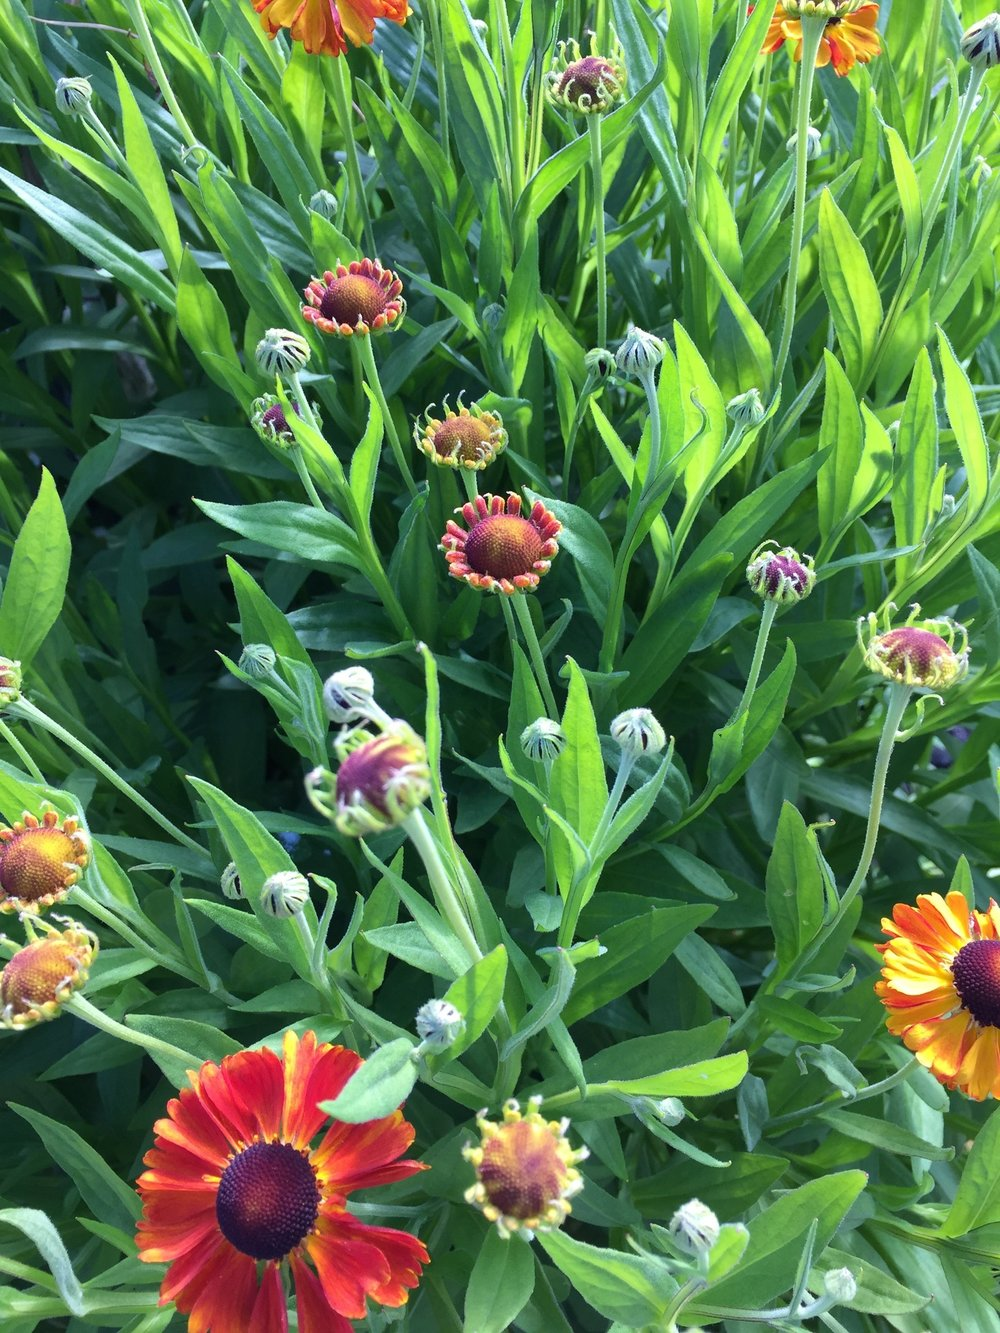 Garden flowers at Turtlehead Farms